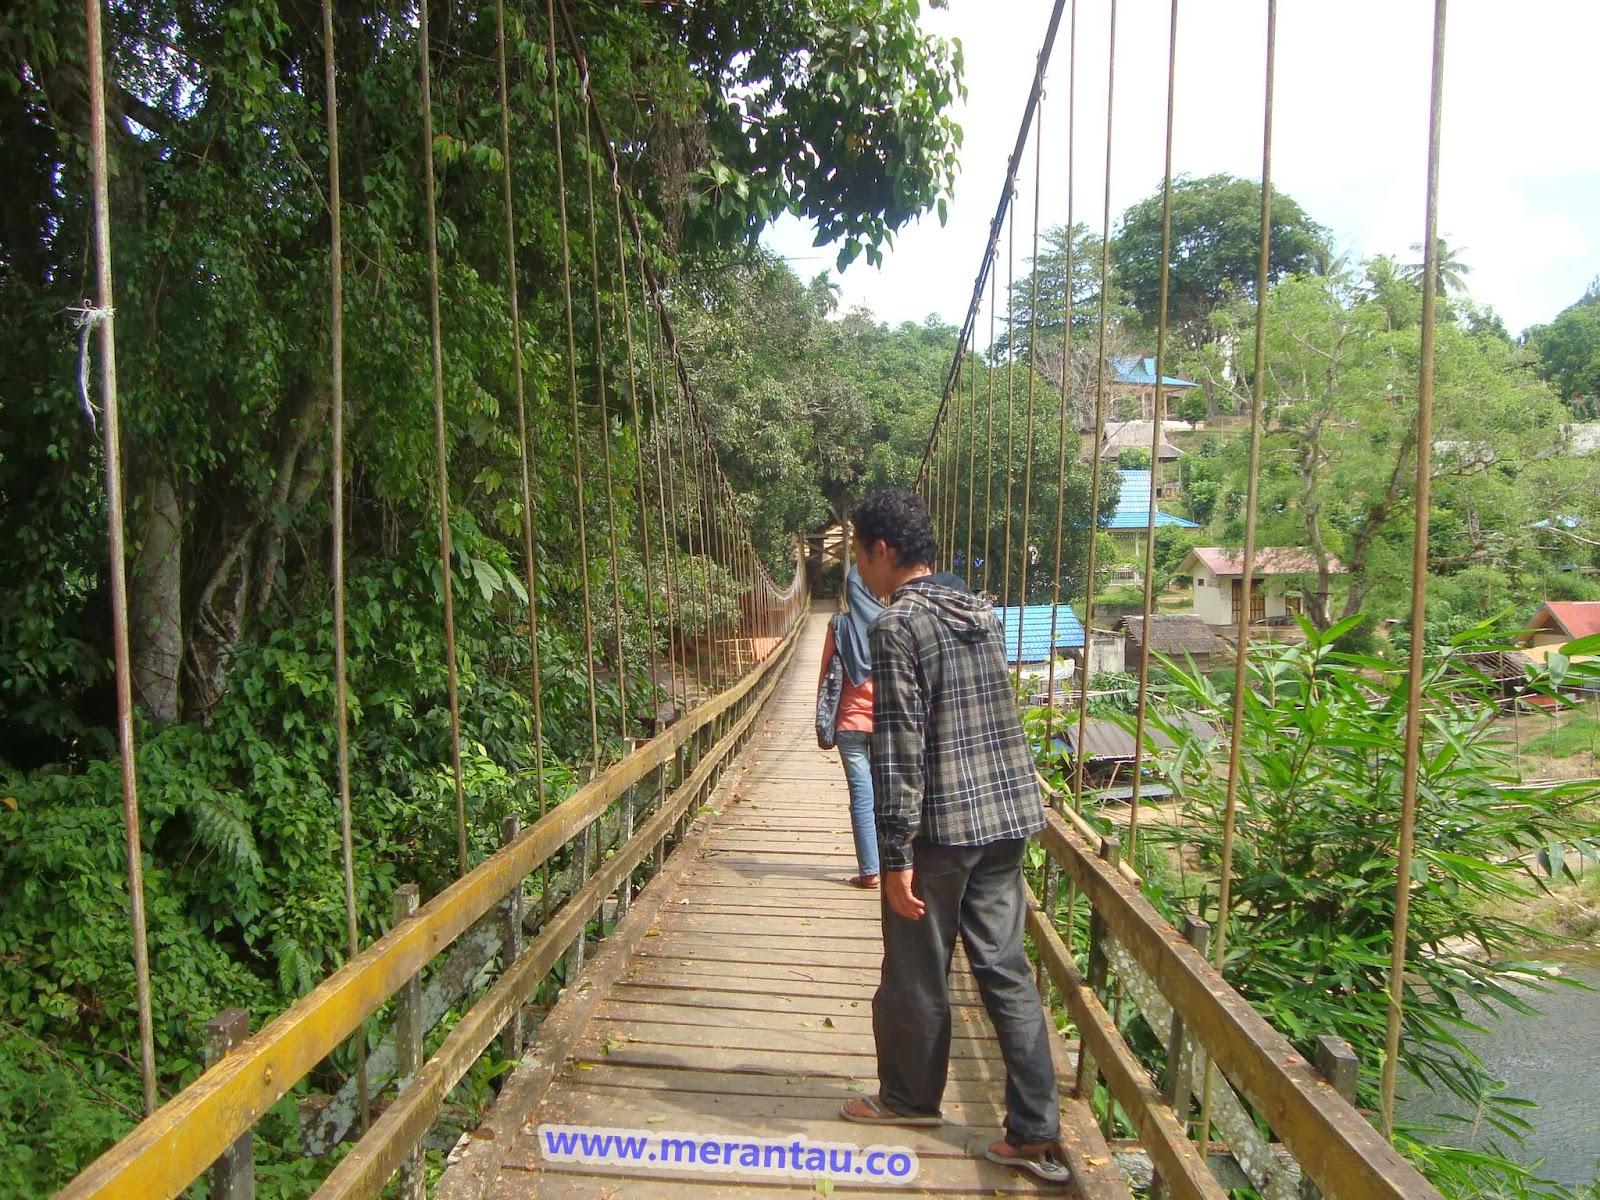 objek wisata di Barabai